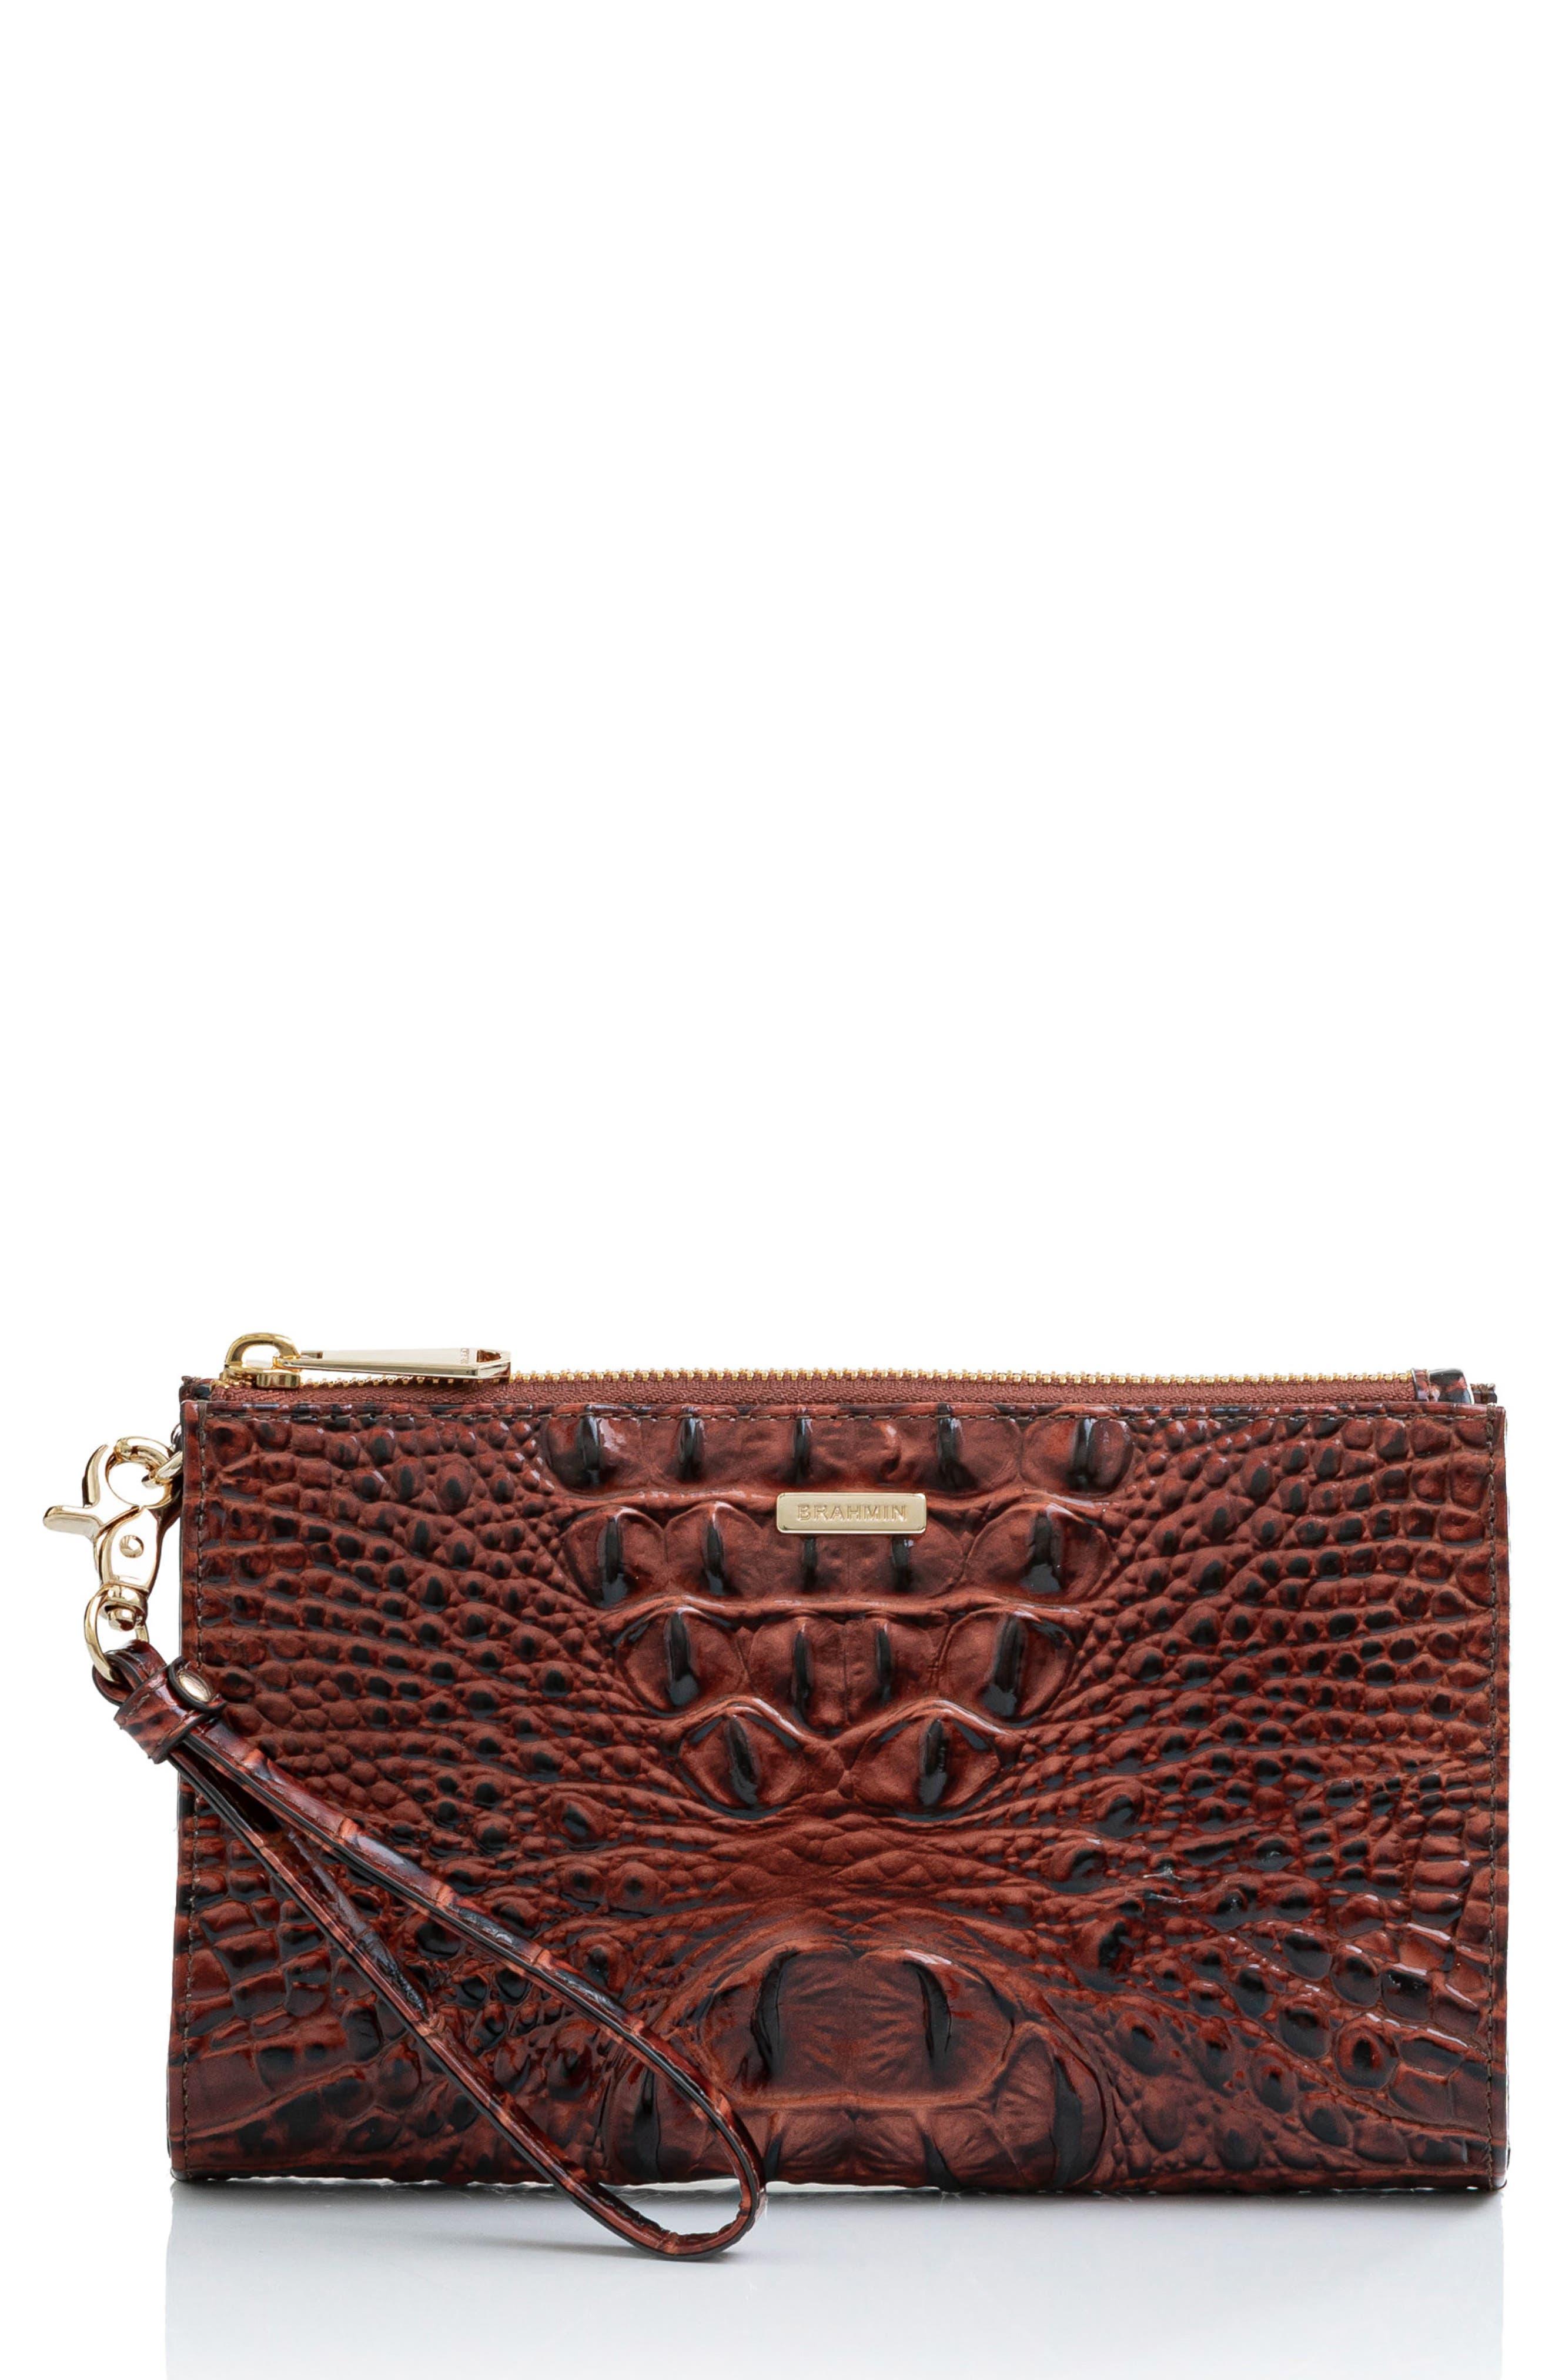 Daisy Croc Embossed Leather Wristlet